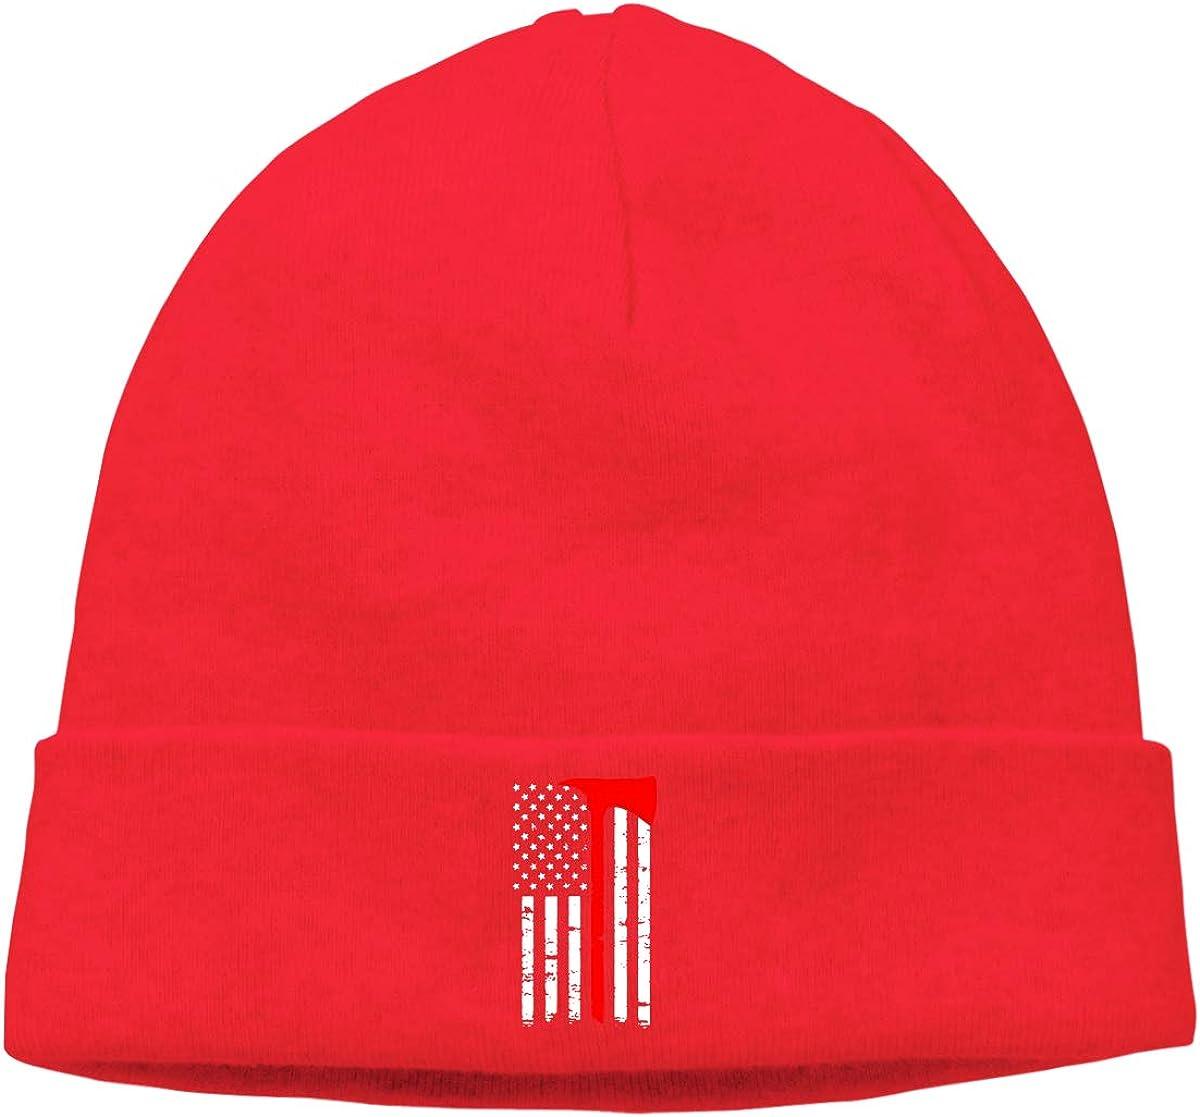 Firefighter Thin Red Line Men /& Women Beanie Winter Warm Knit Beanie Cap